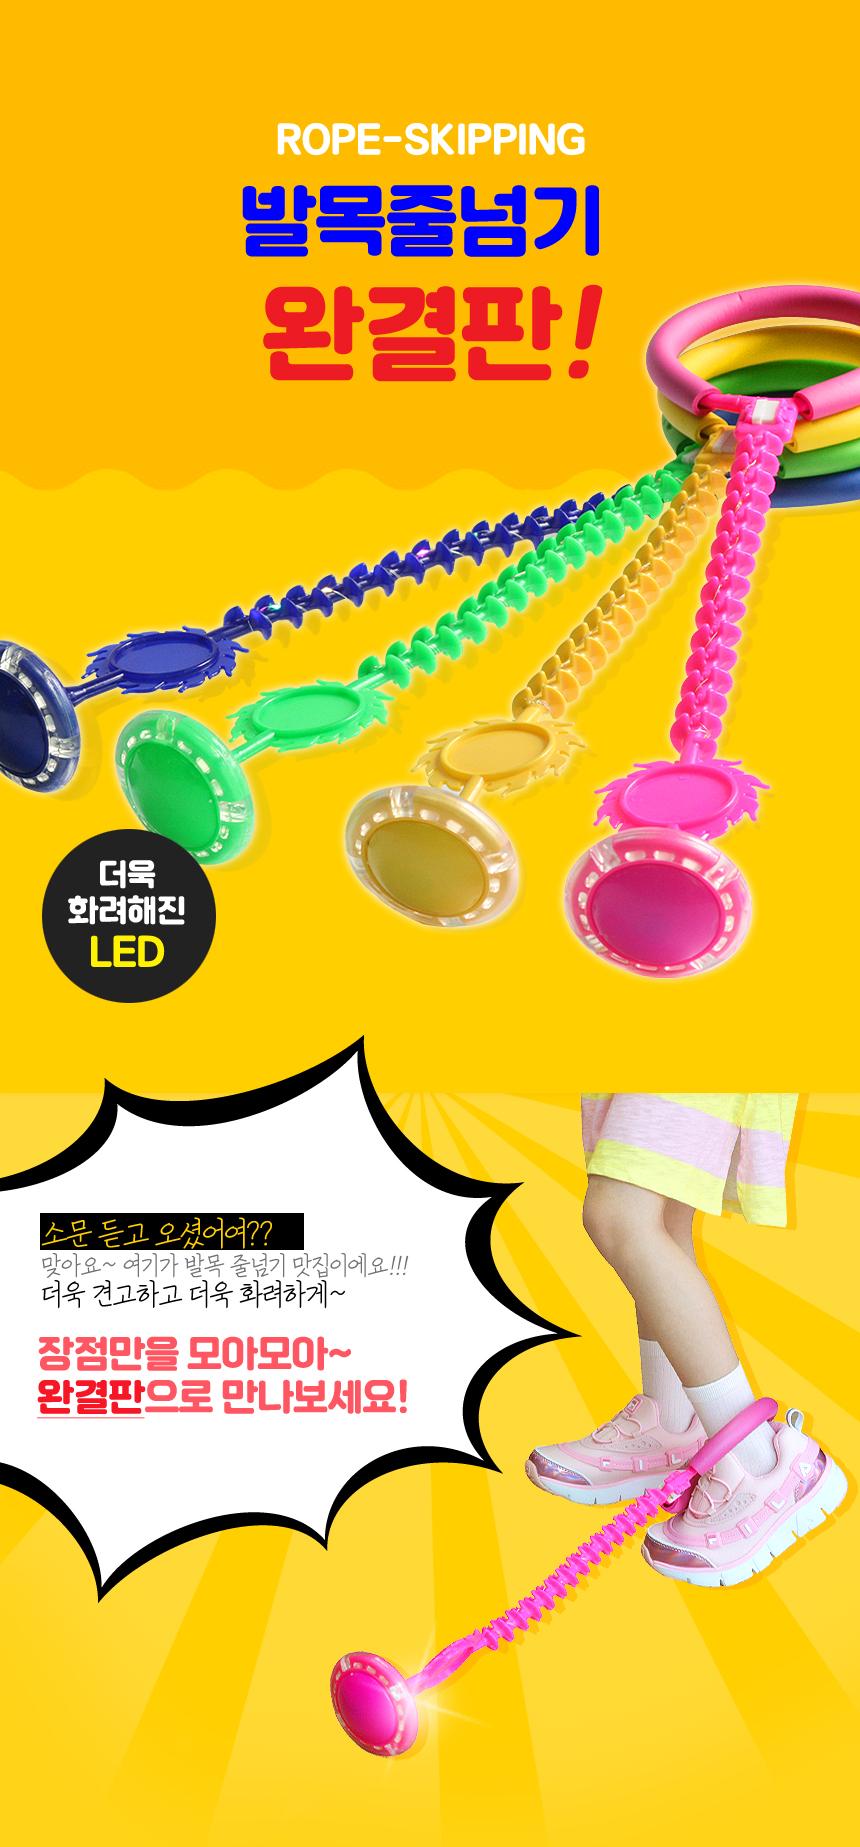 rope_skipping2_01.jpg